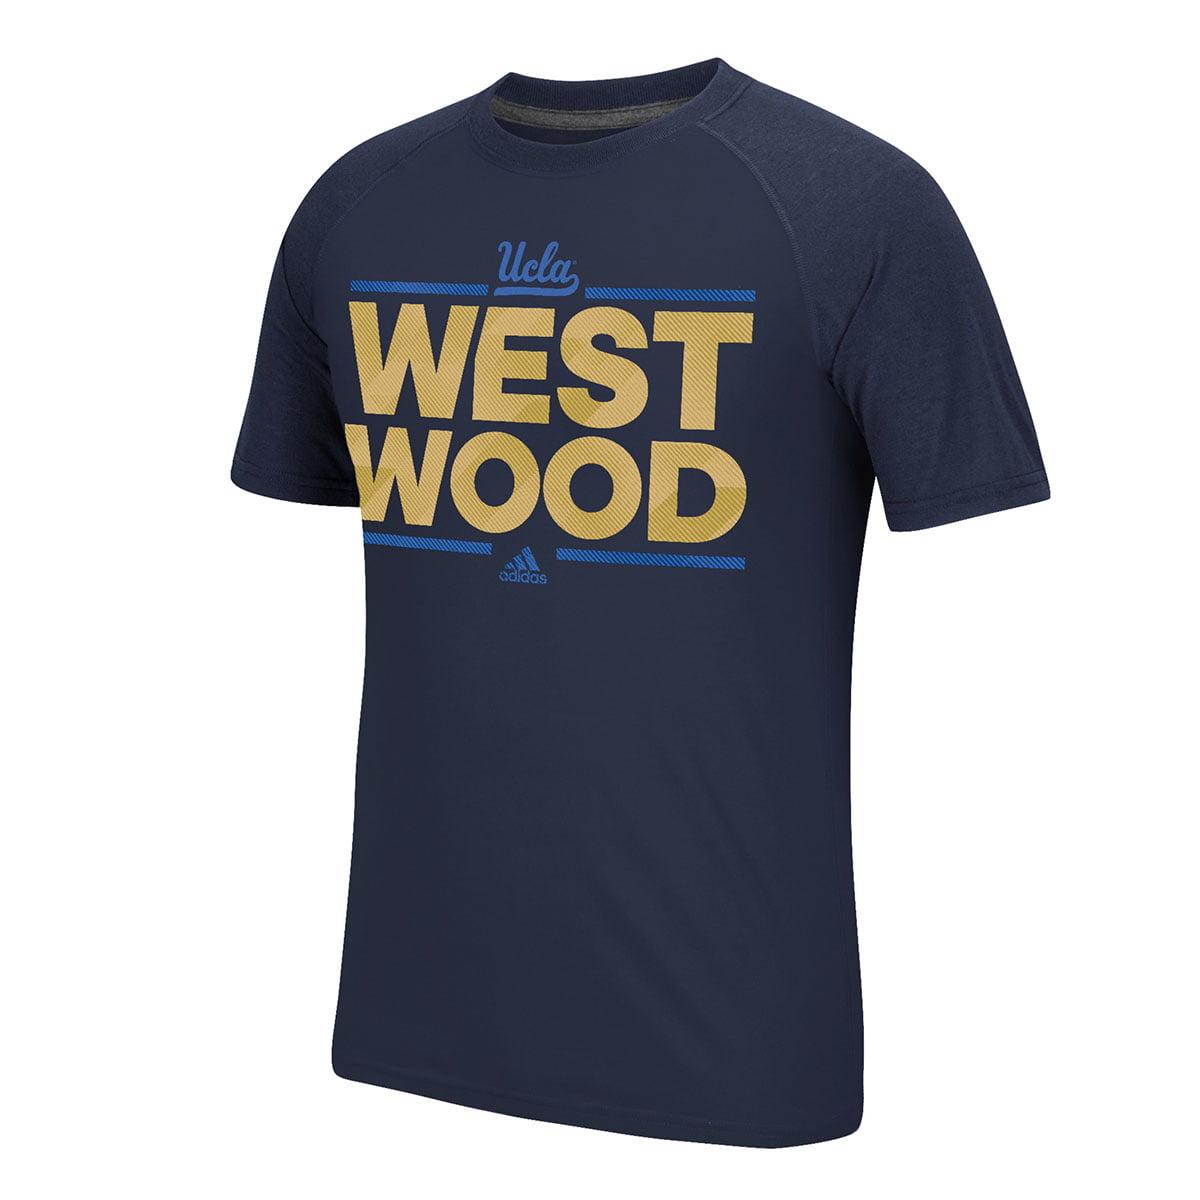 Adidas UCLA Bruins Dassler City Nickname T-Shirt (Navy)